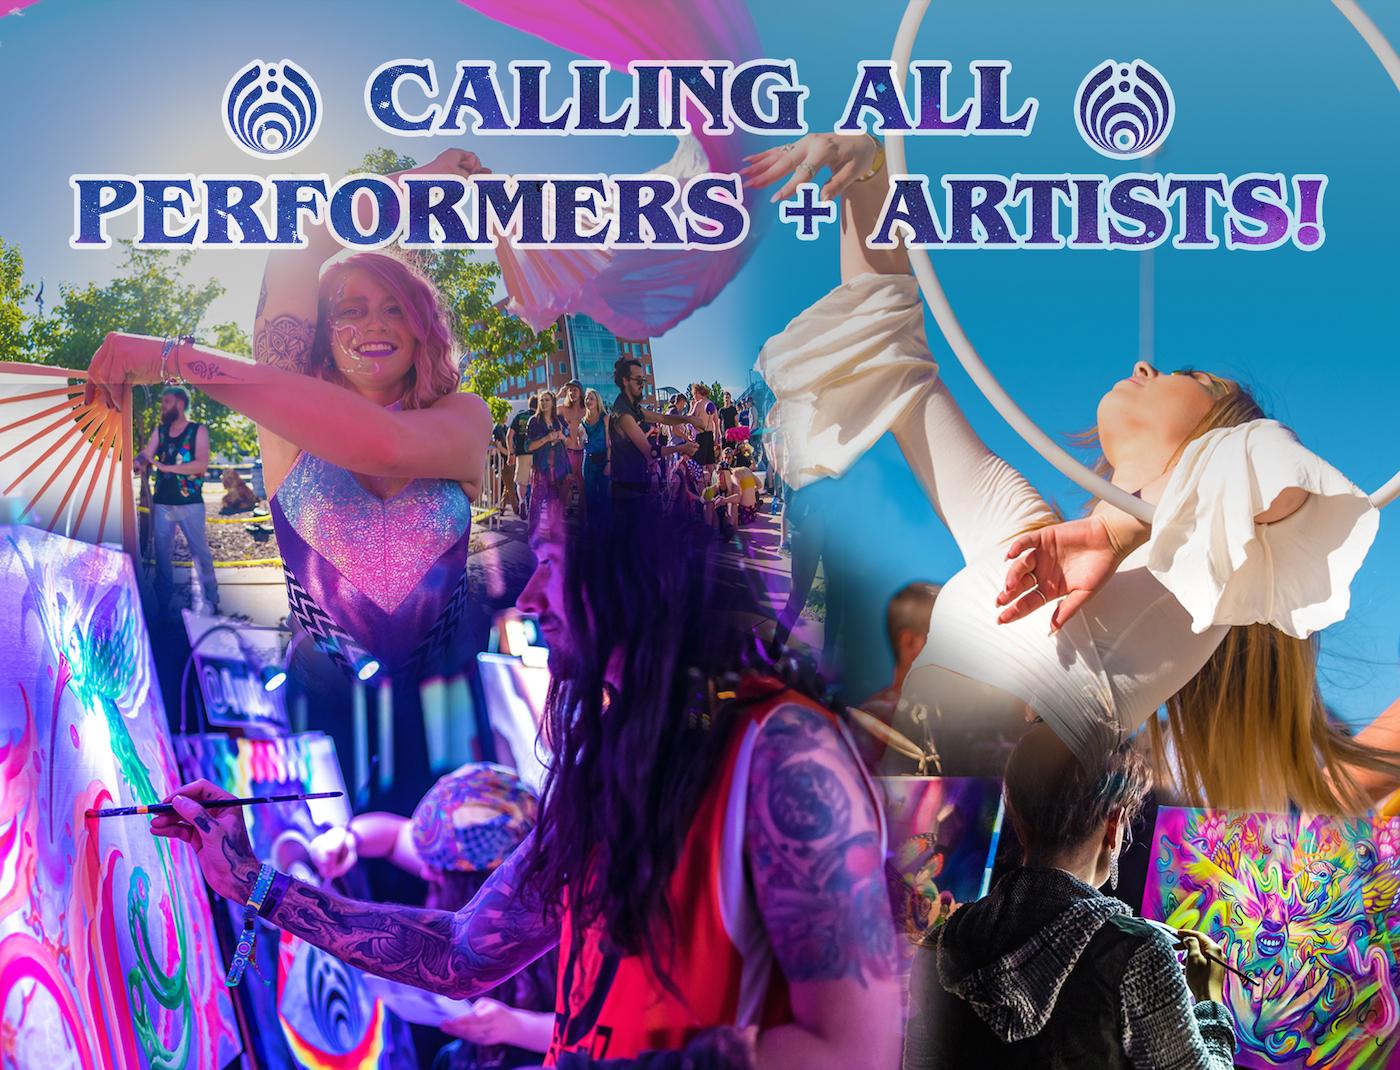 Bass Center XI Art and Performance Applications